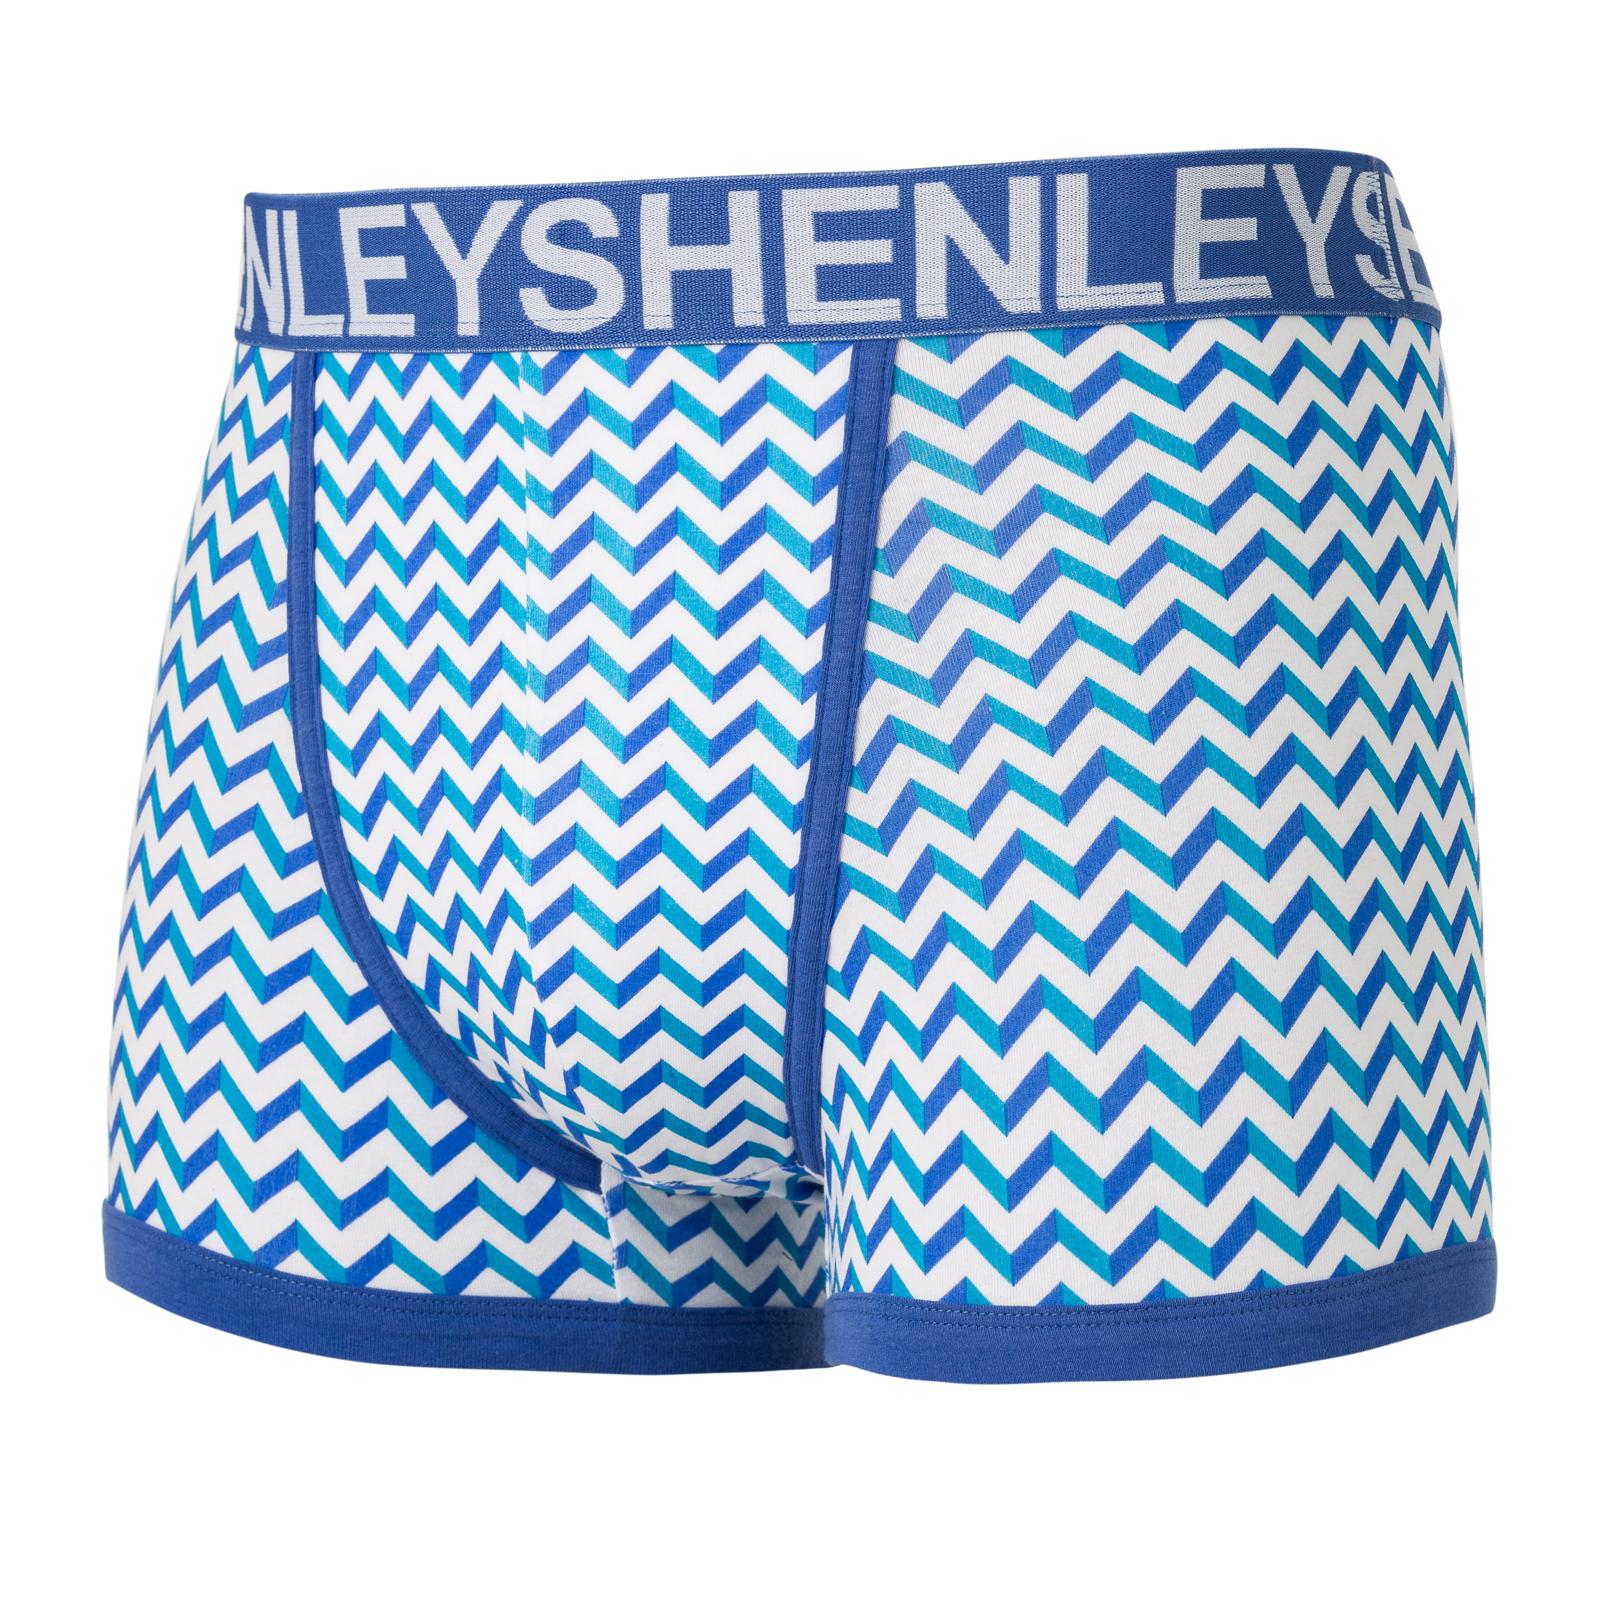 Henleys Mens Designer 3 Pack Boxer Shorts Stretch Jersey Boxed Underwear Trunks